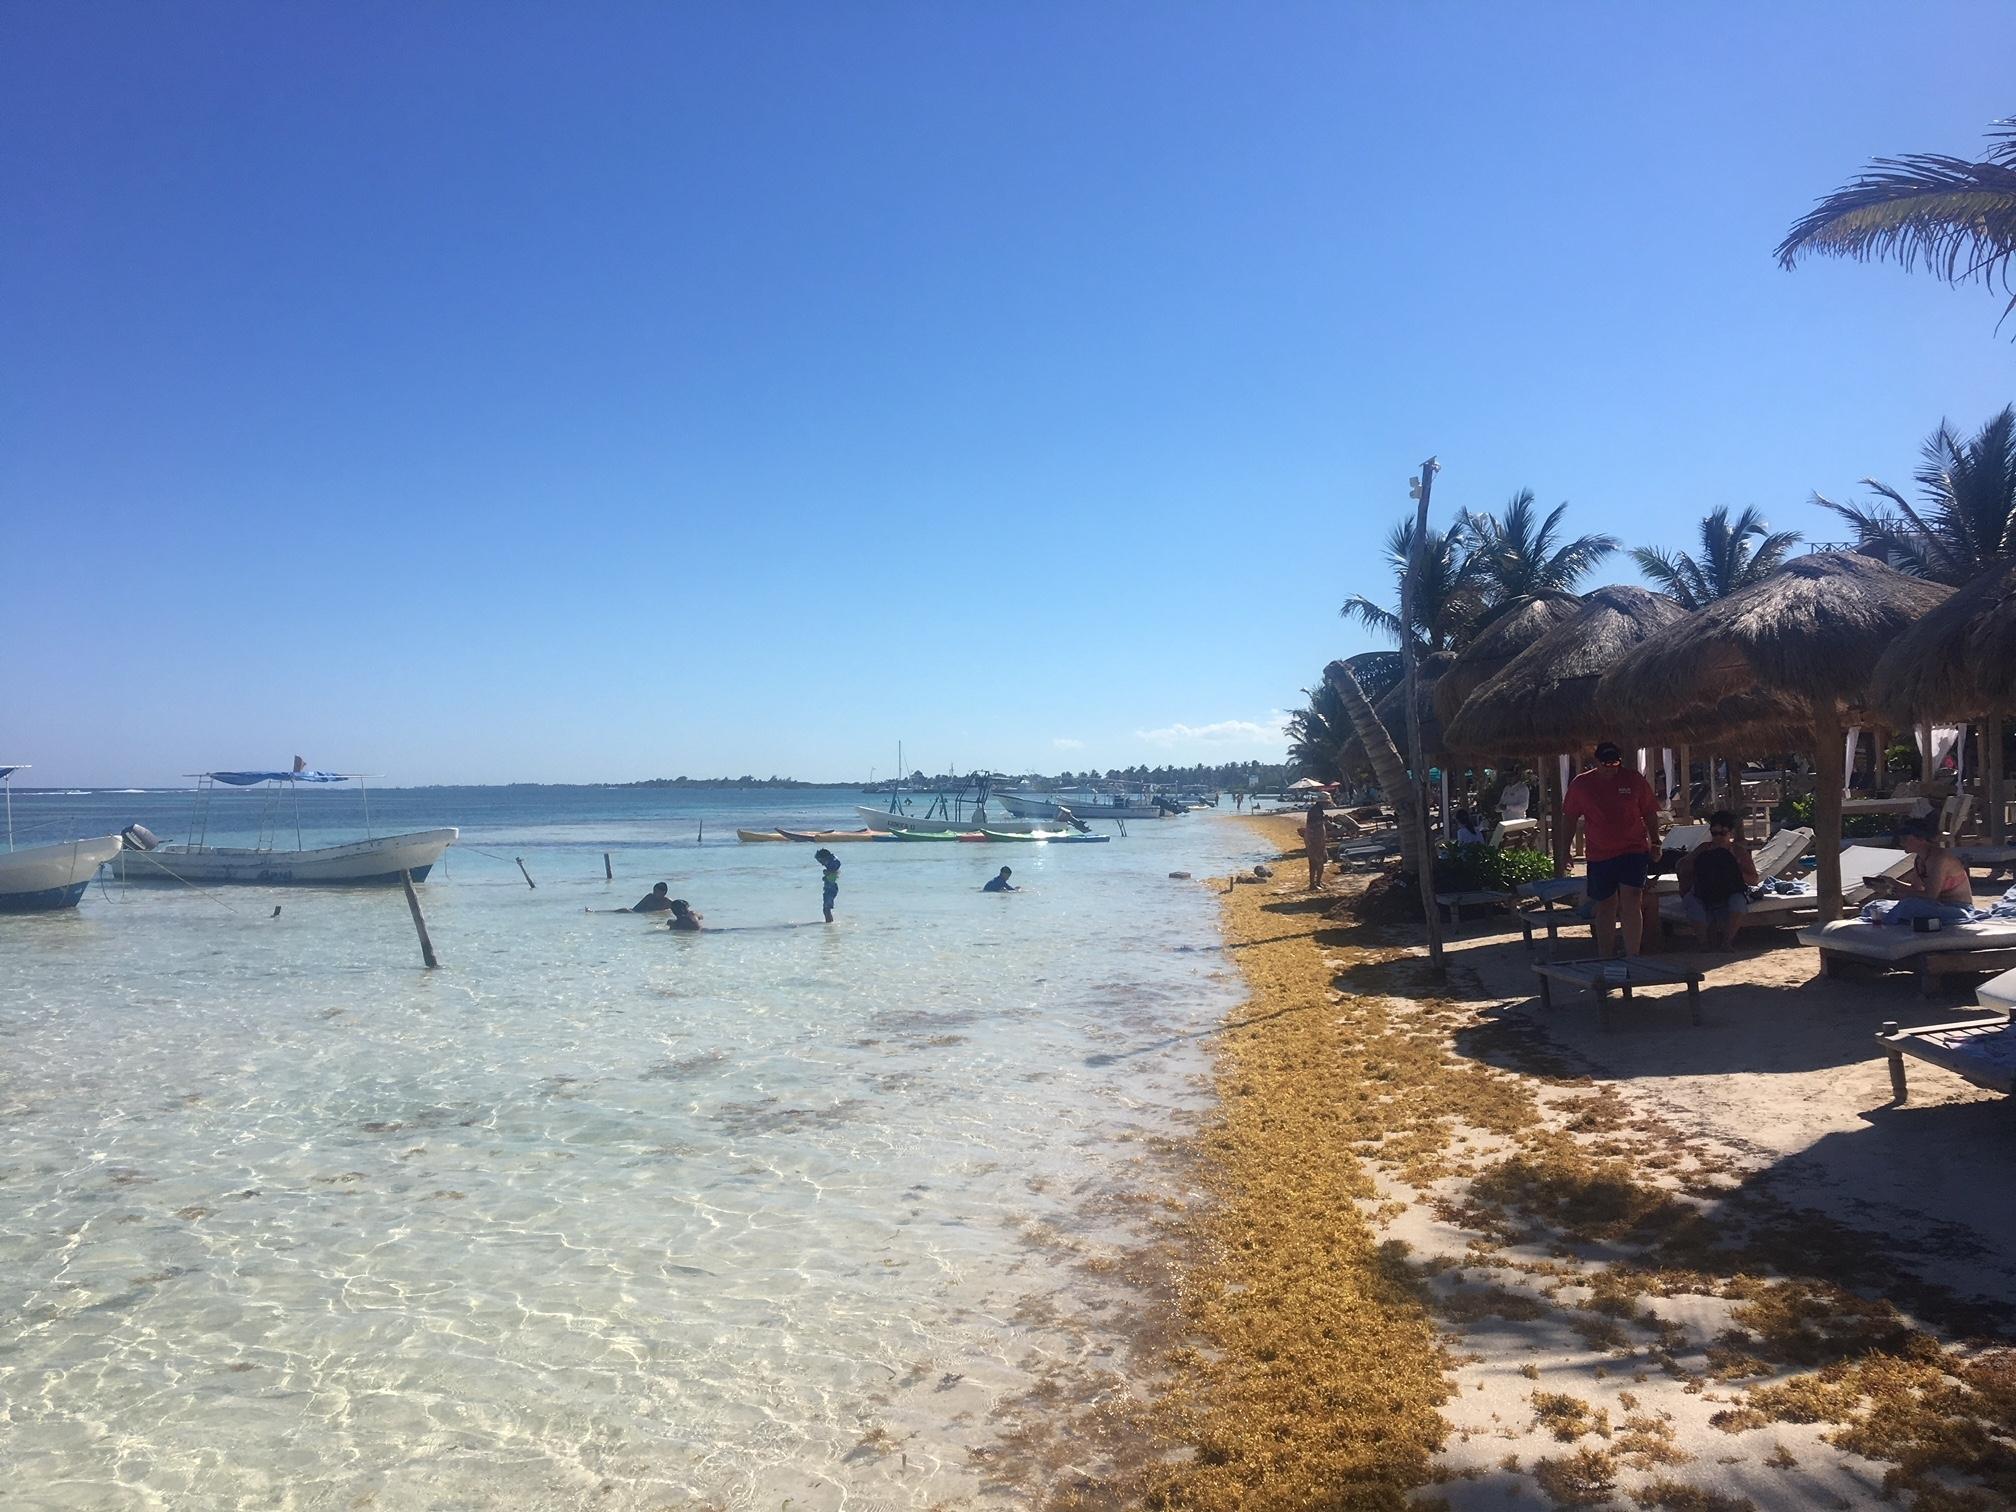 Costa Maya YaYa Beach Break Day Pass Excursion - Costa